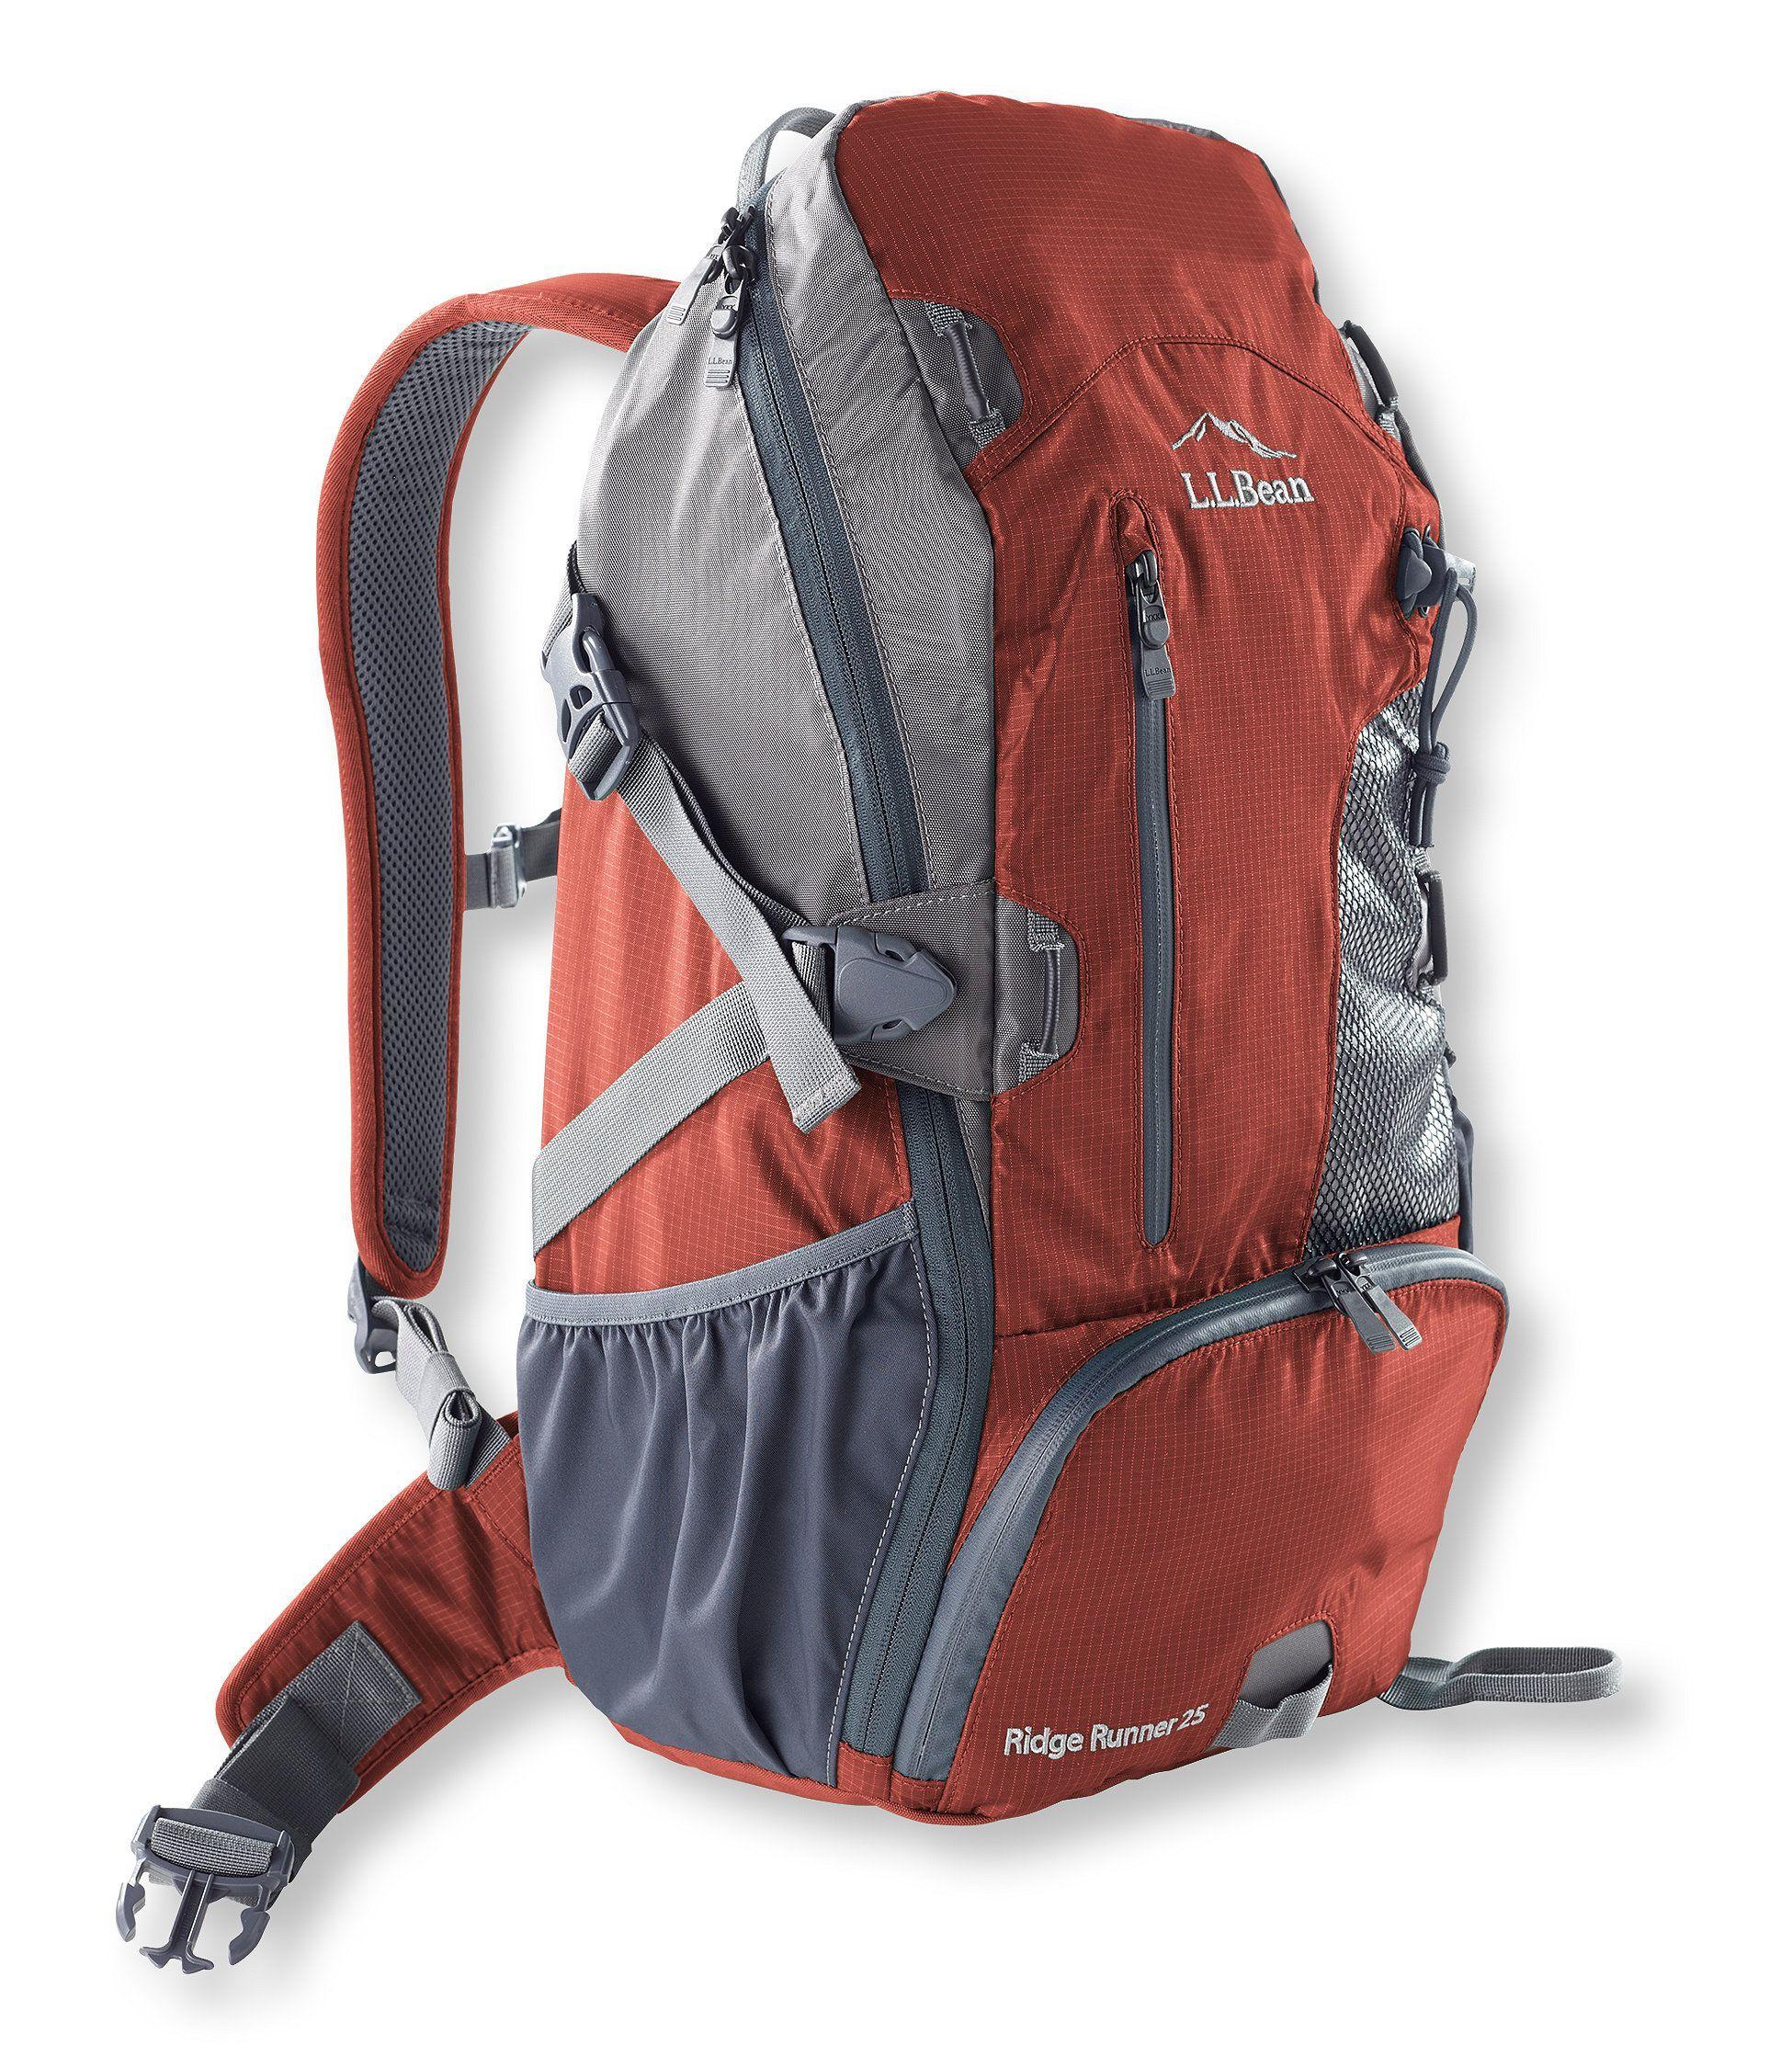 Ridge Runner 25 Day Pack Hiking gear, Backpacking gear